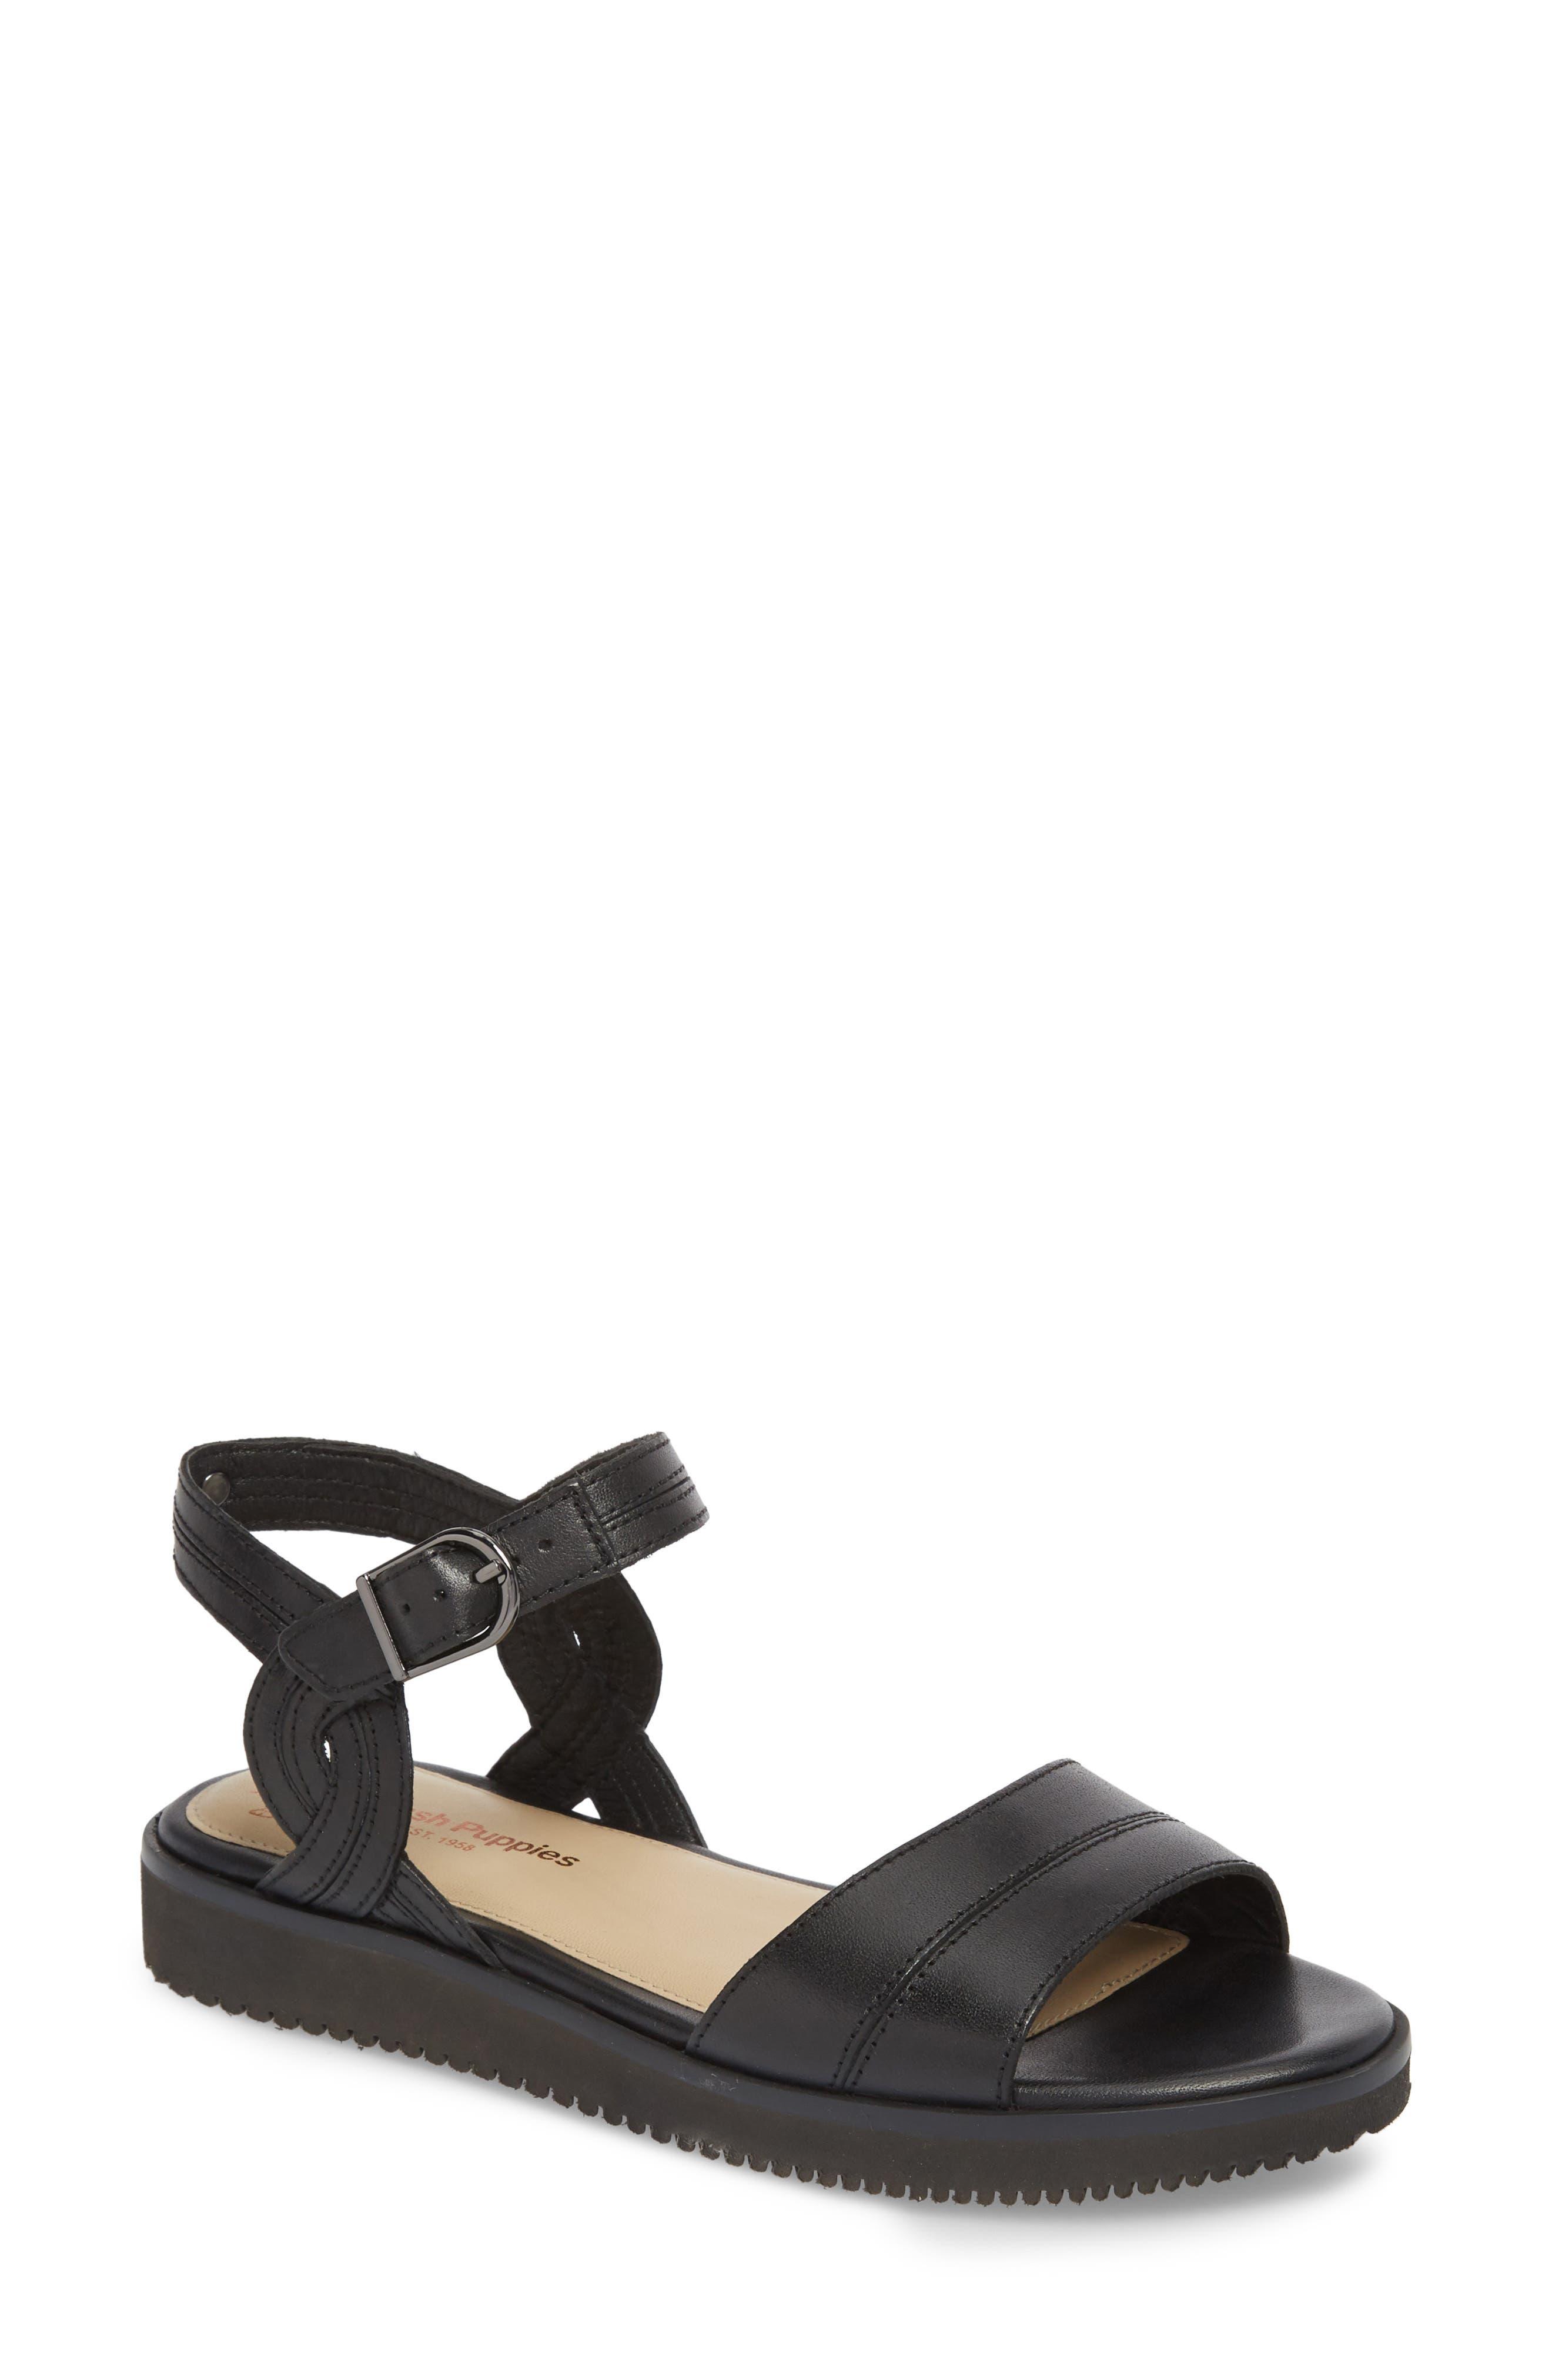 Quarter Strap Sandal,                         Main,                         color, 007